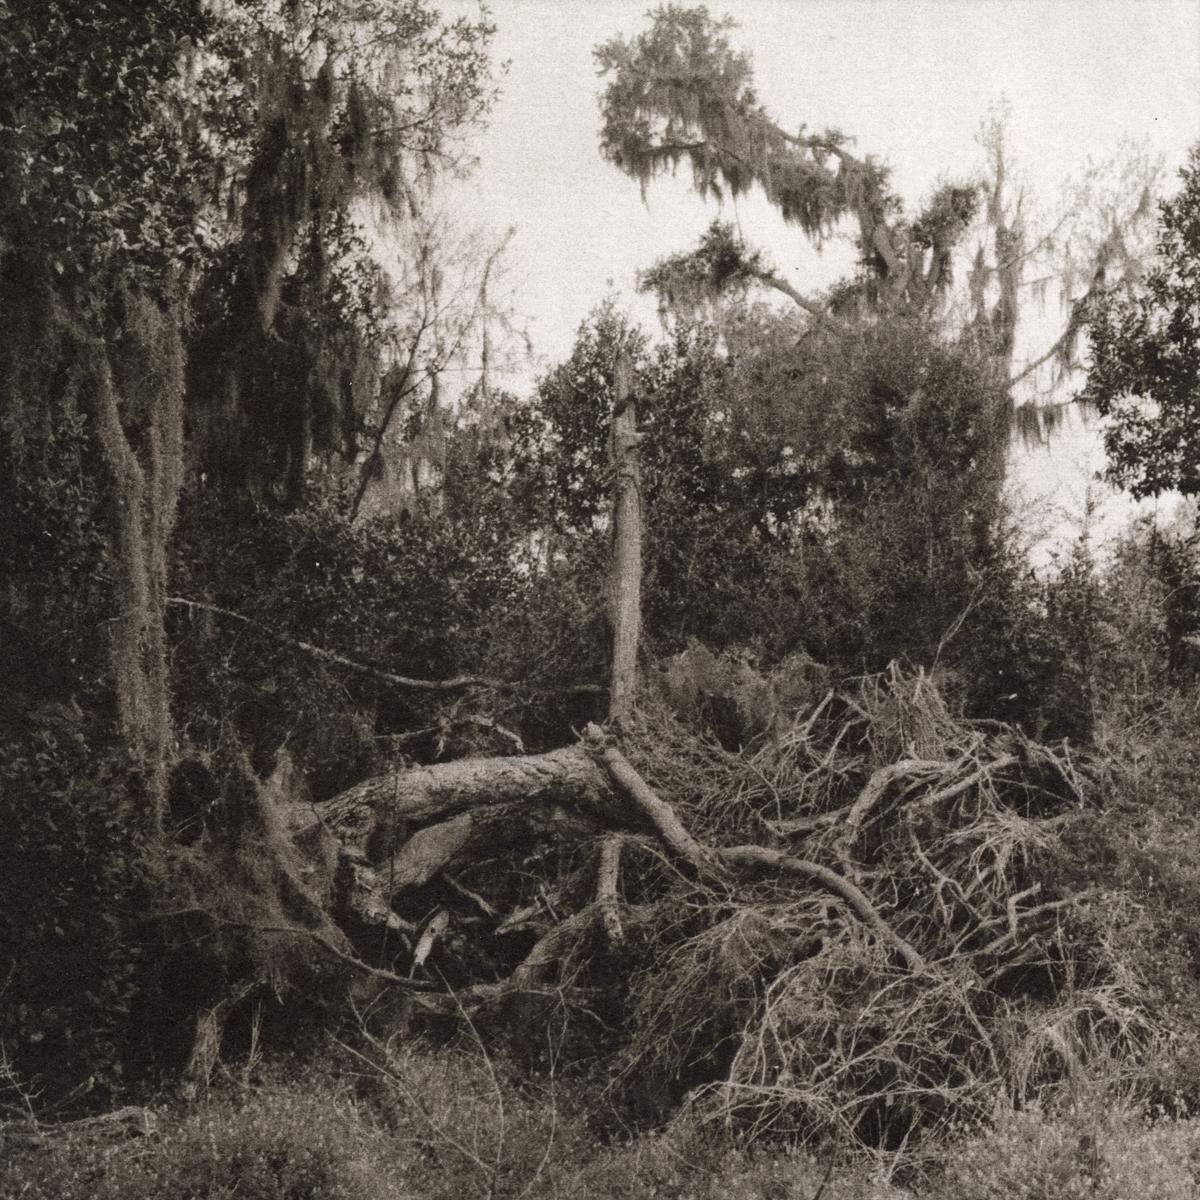 Fallen Tree, Savannah Wildlife Refuge, Savannah, GA